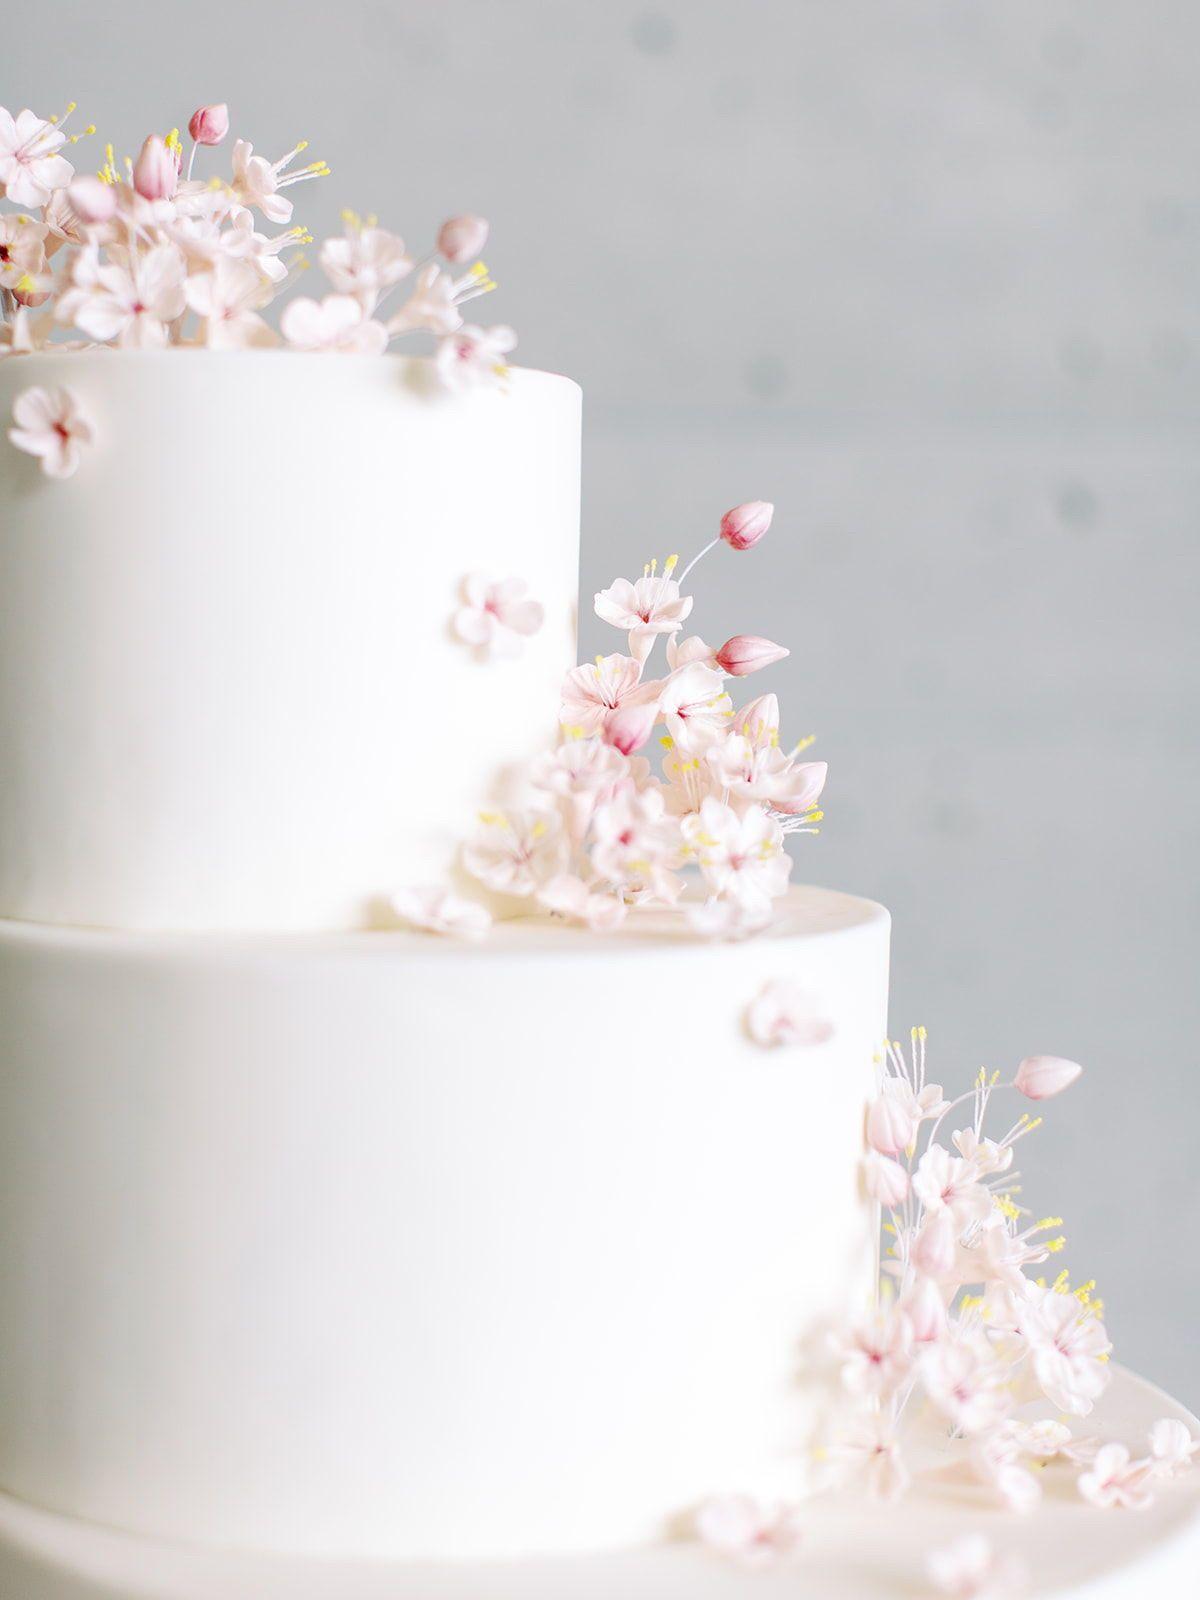 Modern Wedding Cake Cherry Blossom Cake Flour Flourish Rachael Ellen Events Cherry Blossom Wedding Cake Cherry Blossom Wedding Wedding Cake Decorations